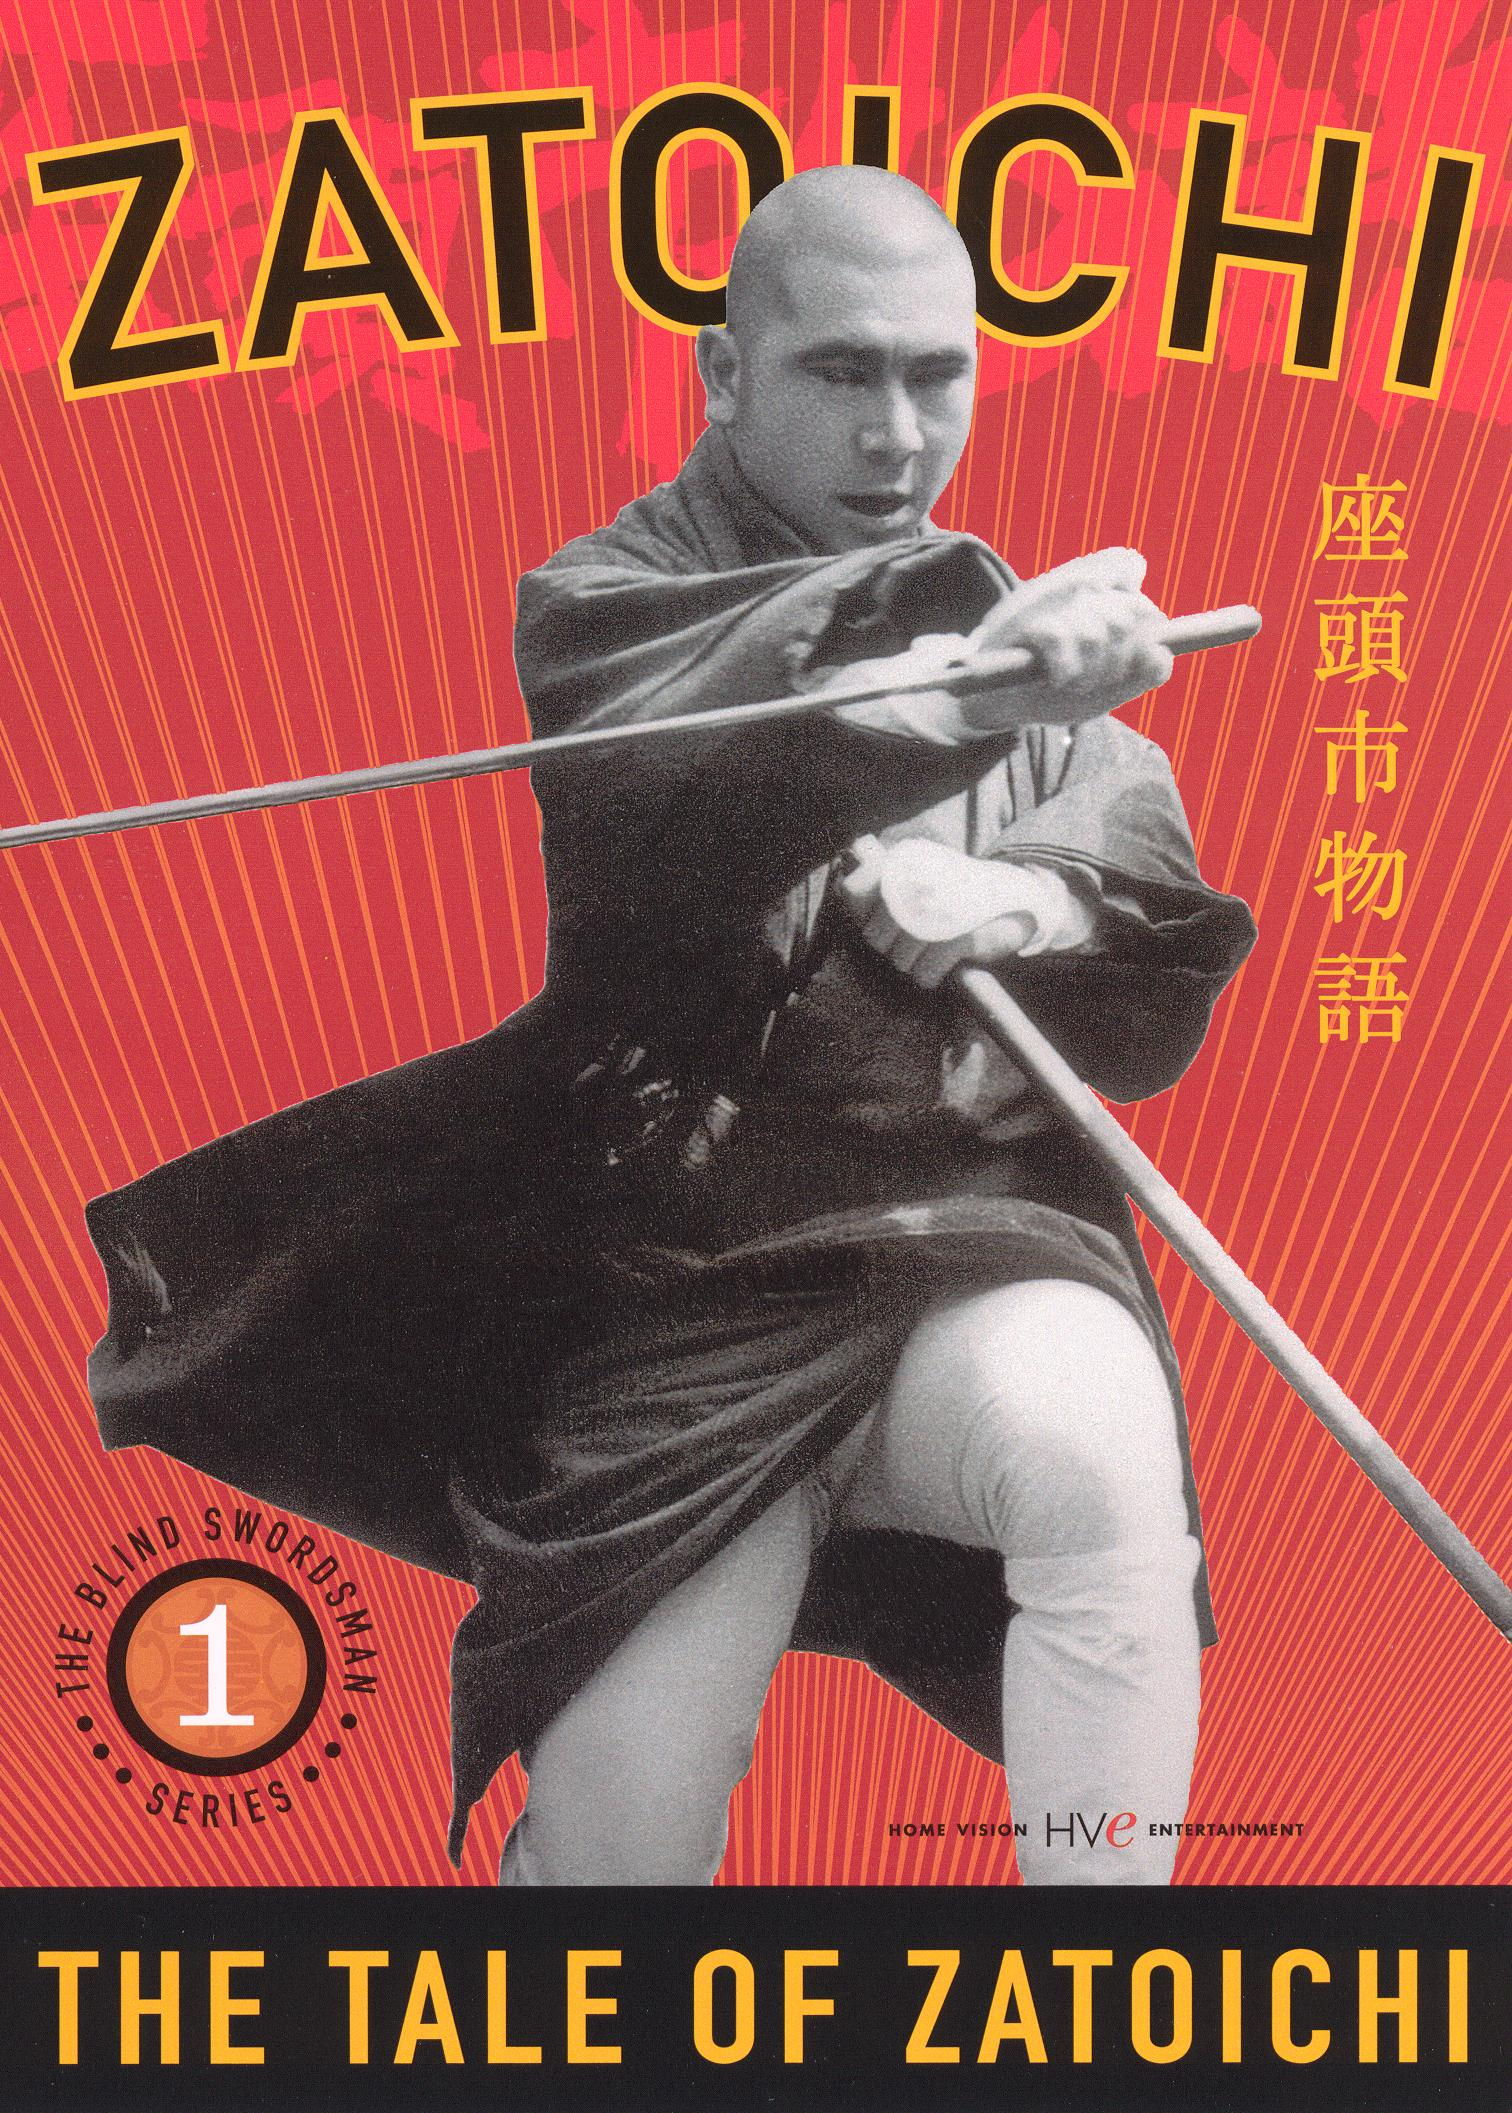 The Tale Of Zatoichi 1962 Kenji Misumi Synopsis